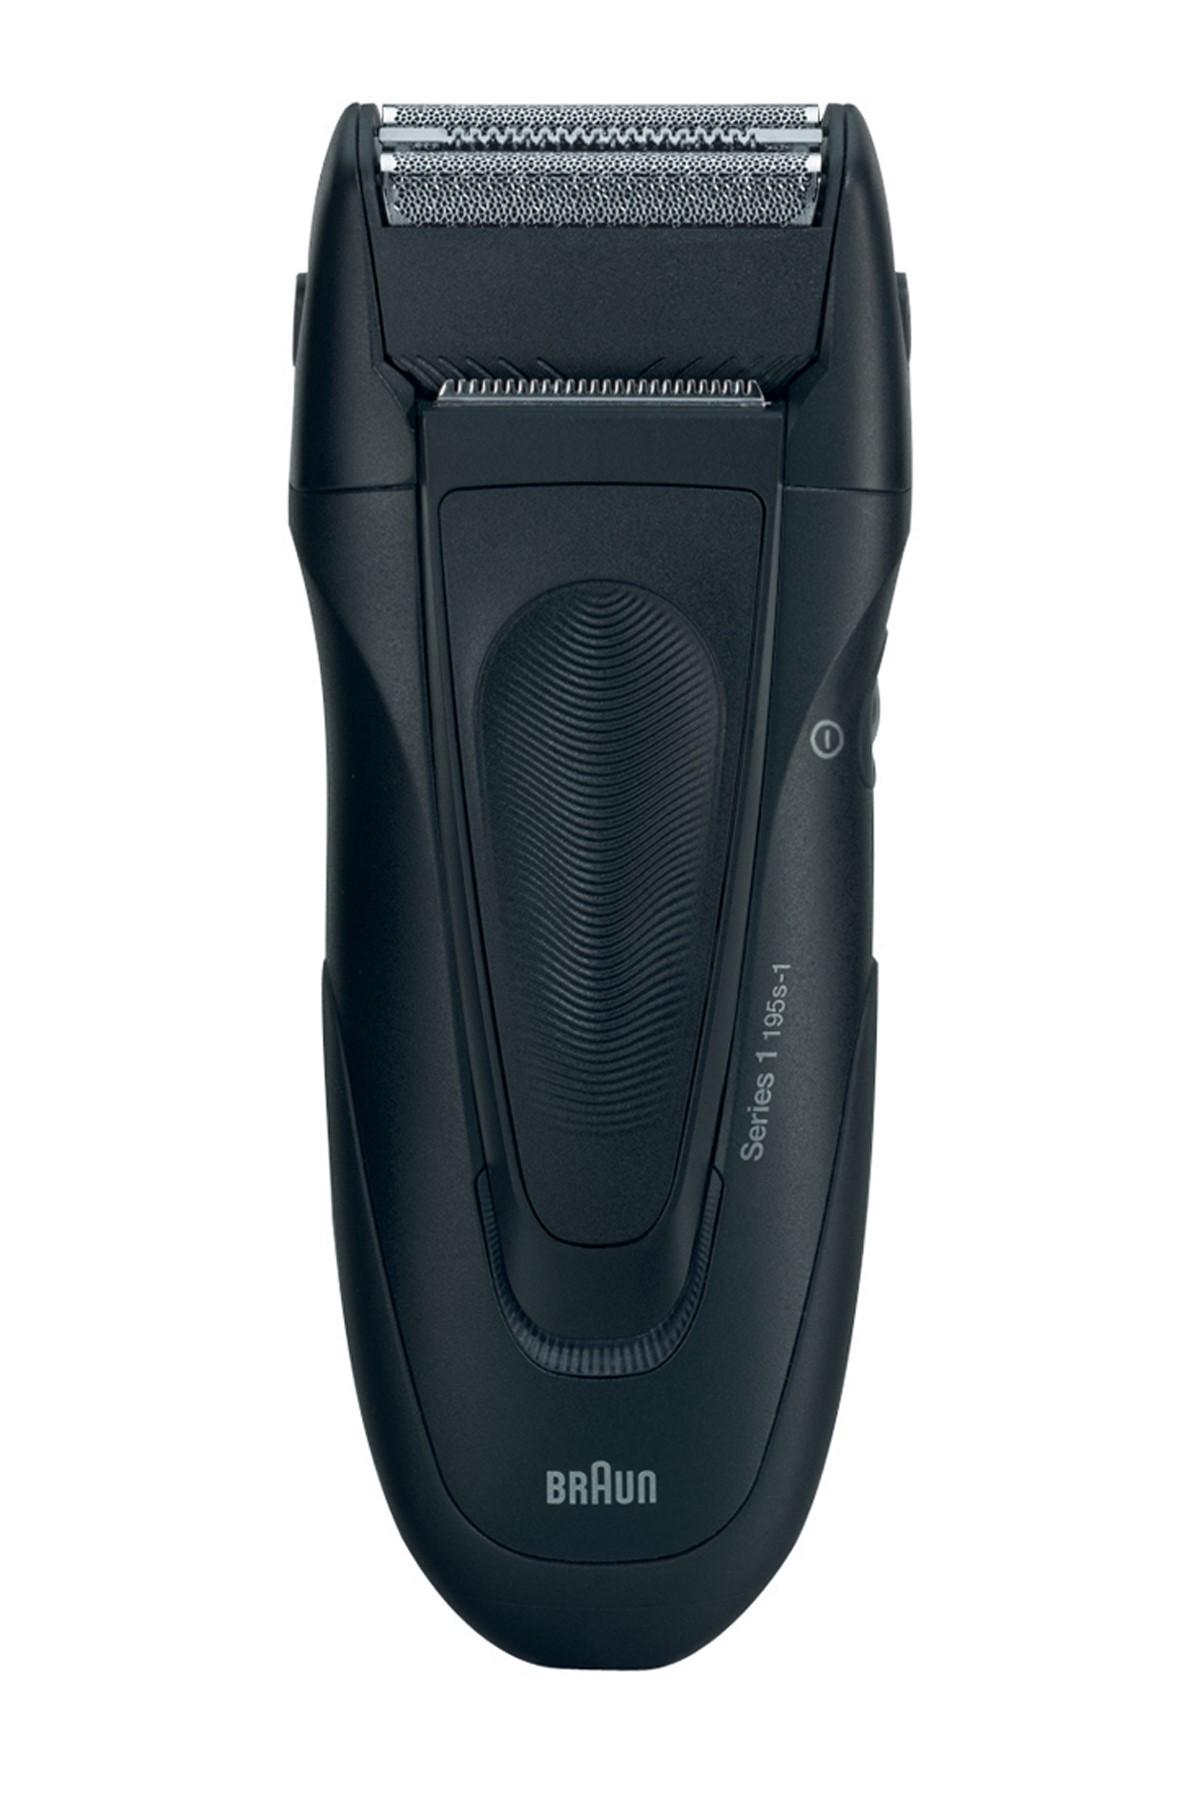 Braun 195s-1 Şarjlı Tıraş Makinesi 1